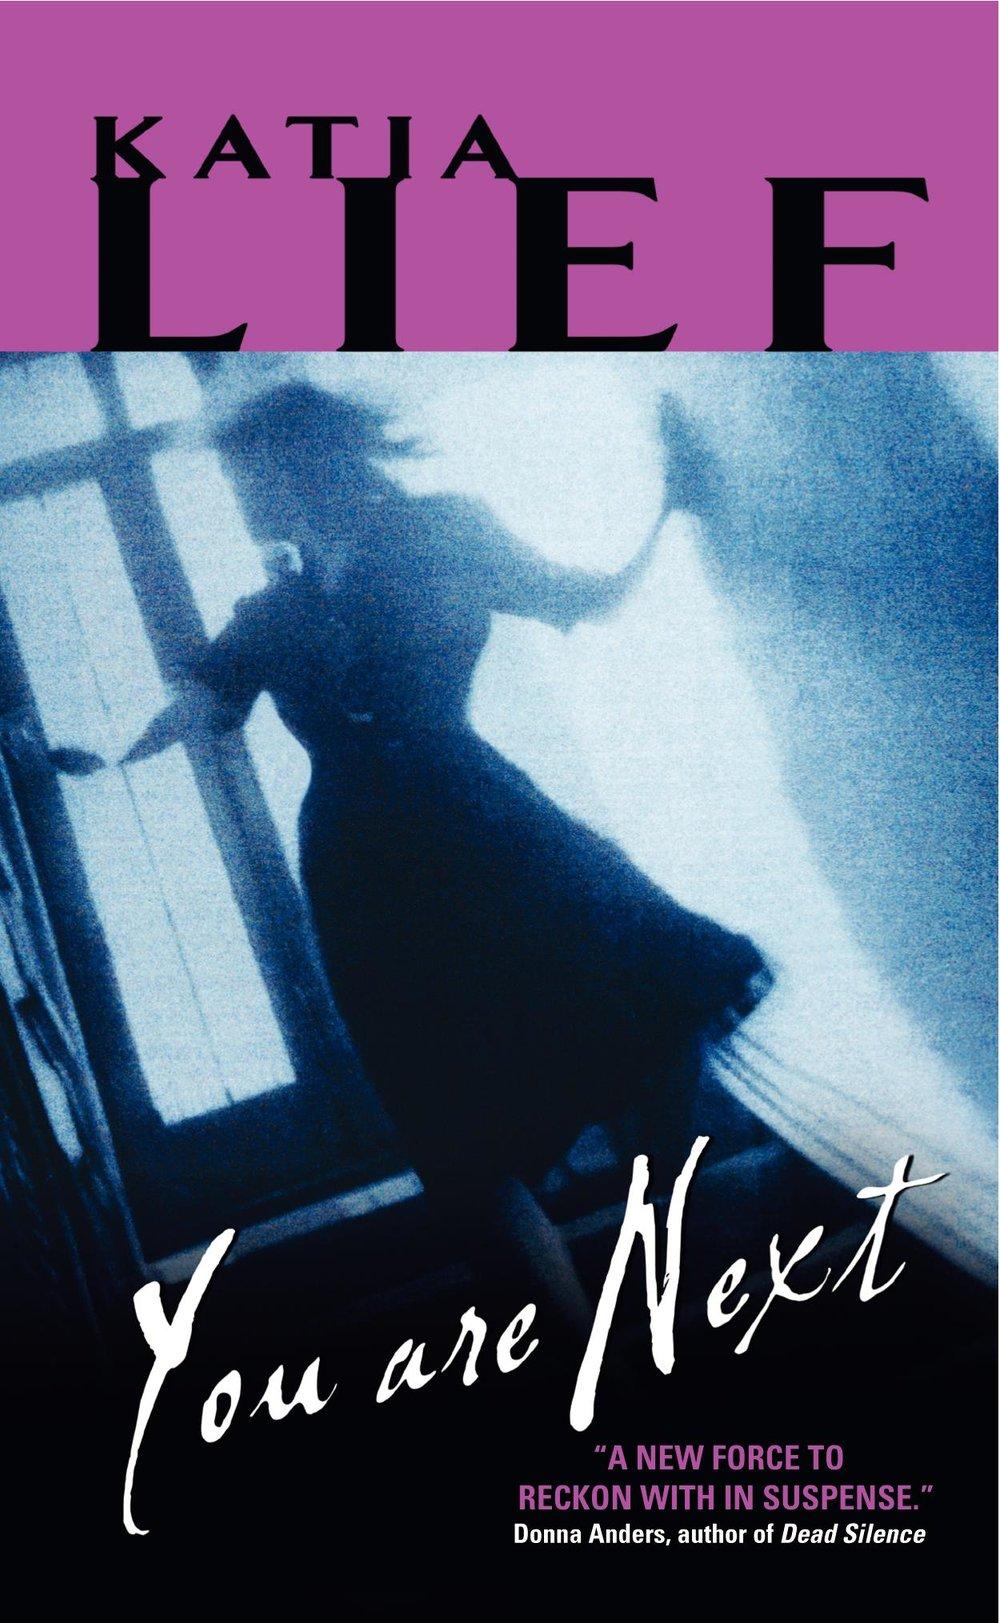 Book 1 in the Karin Schaeffer series